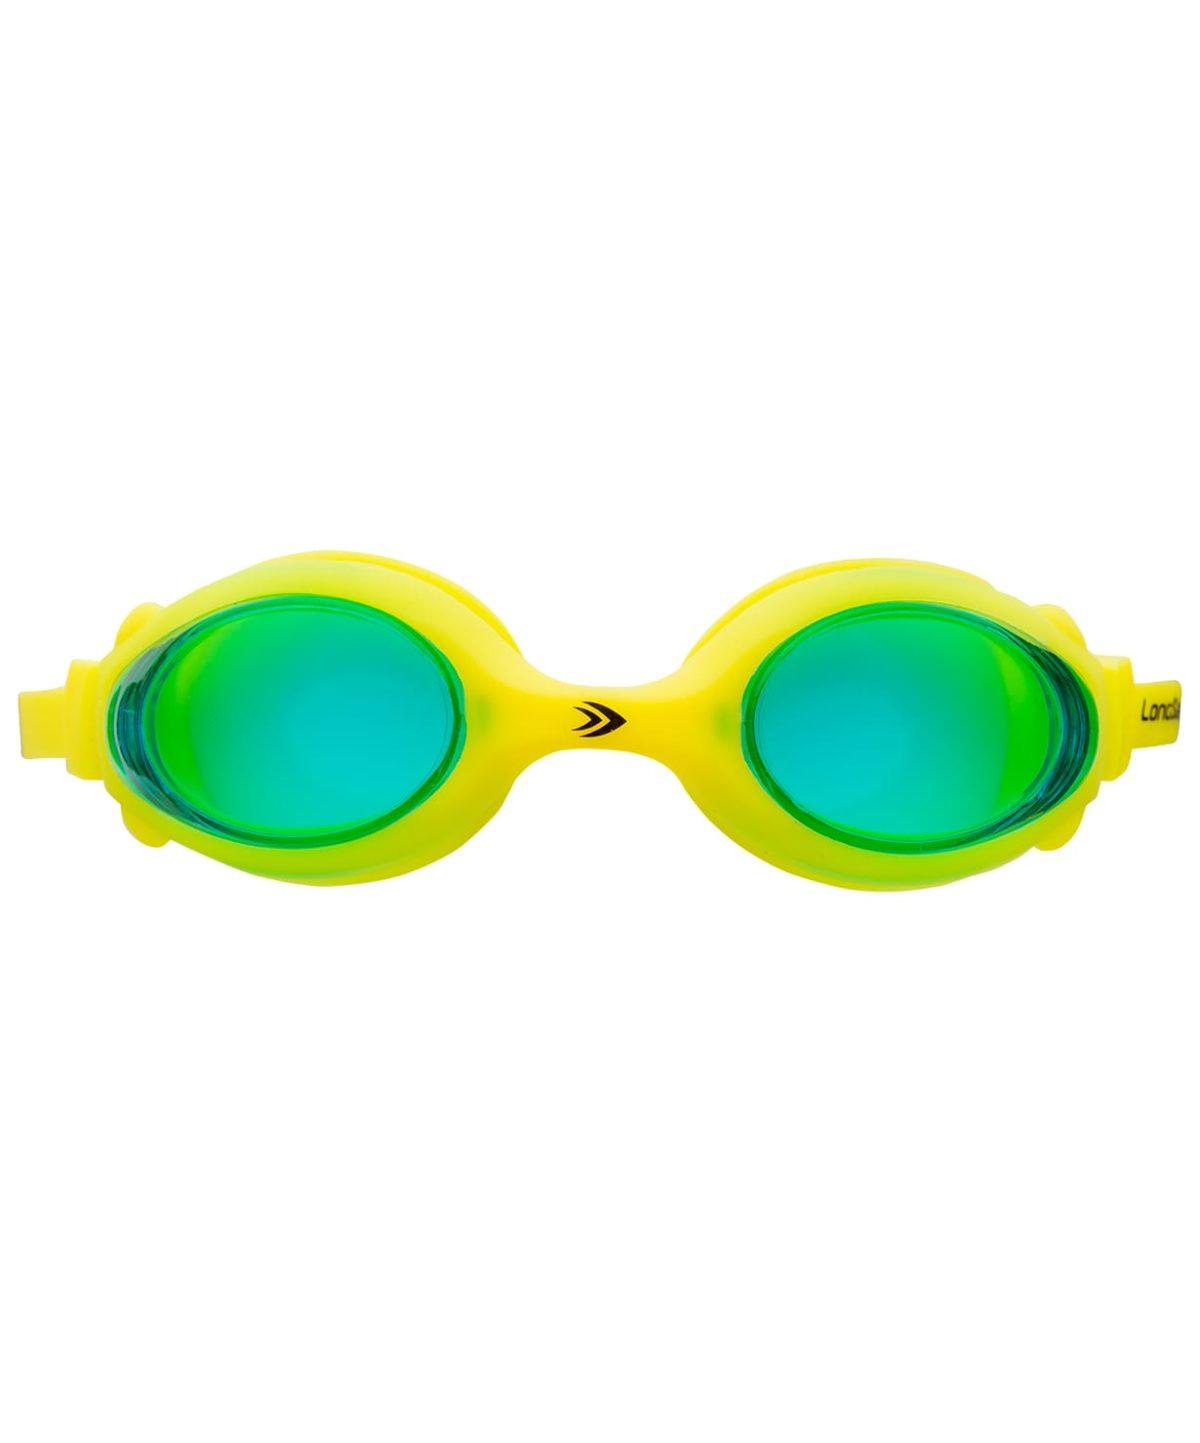 LONGSAIL Kids Marine Очки для плавания  L041020: зеленый/желтый - 2